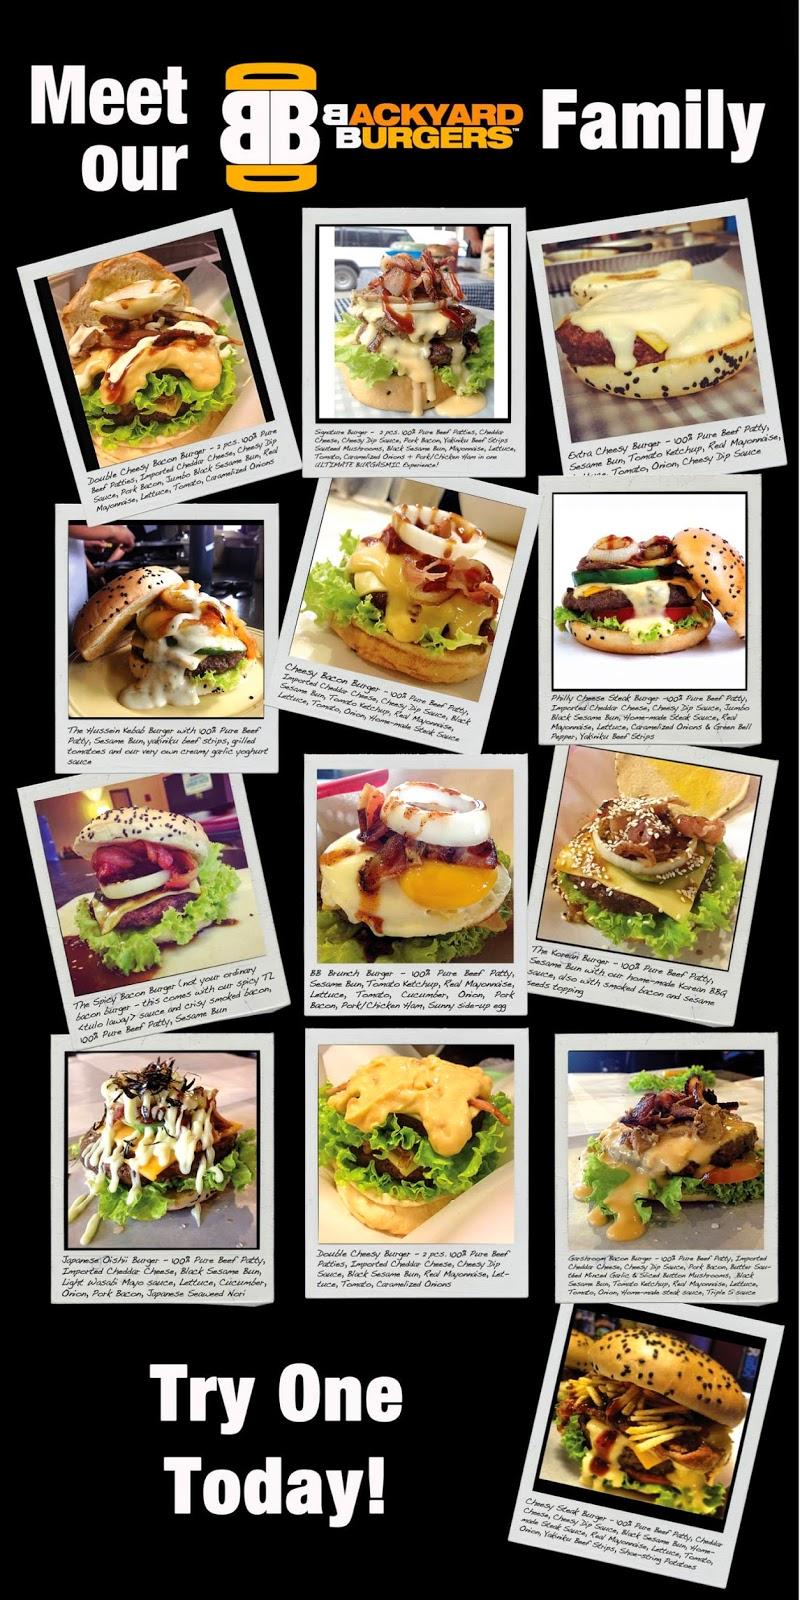 eats good to be in cagayan de oro backyard burgers will be in cdo